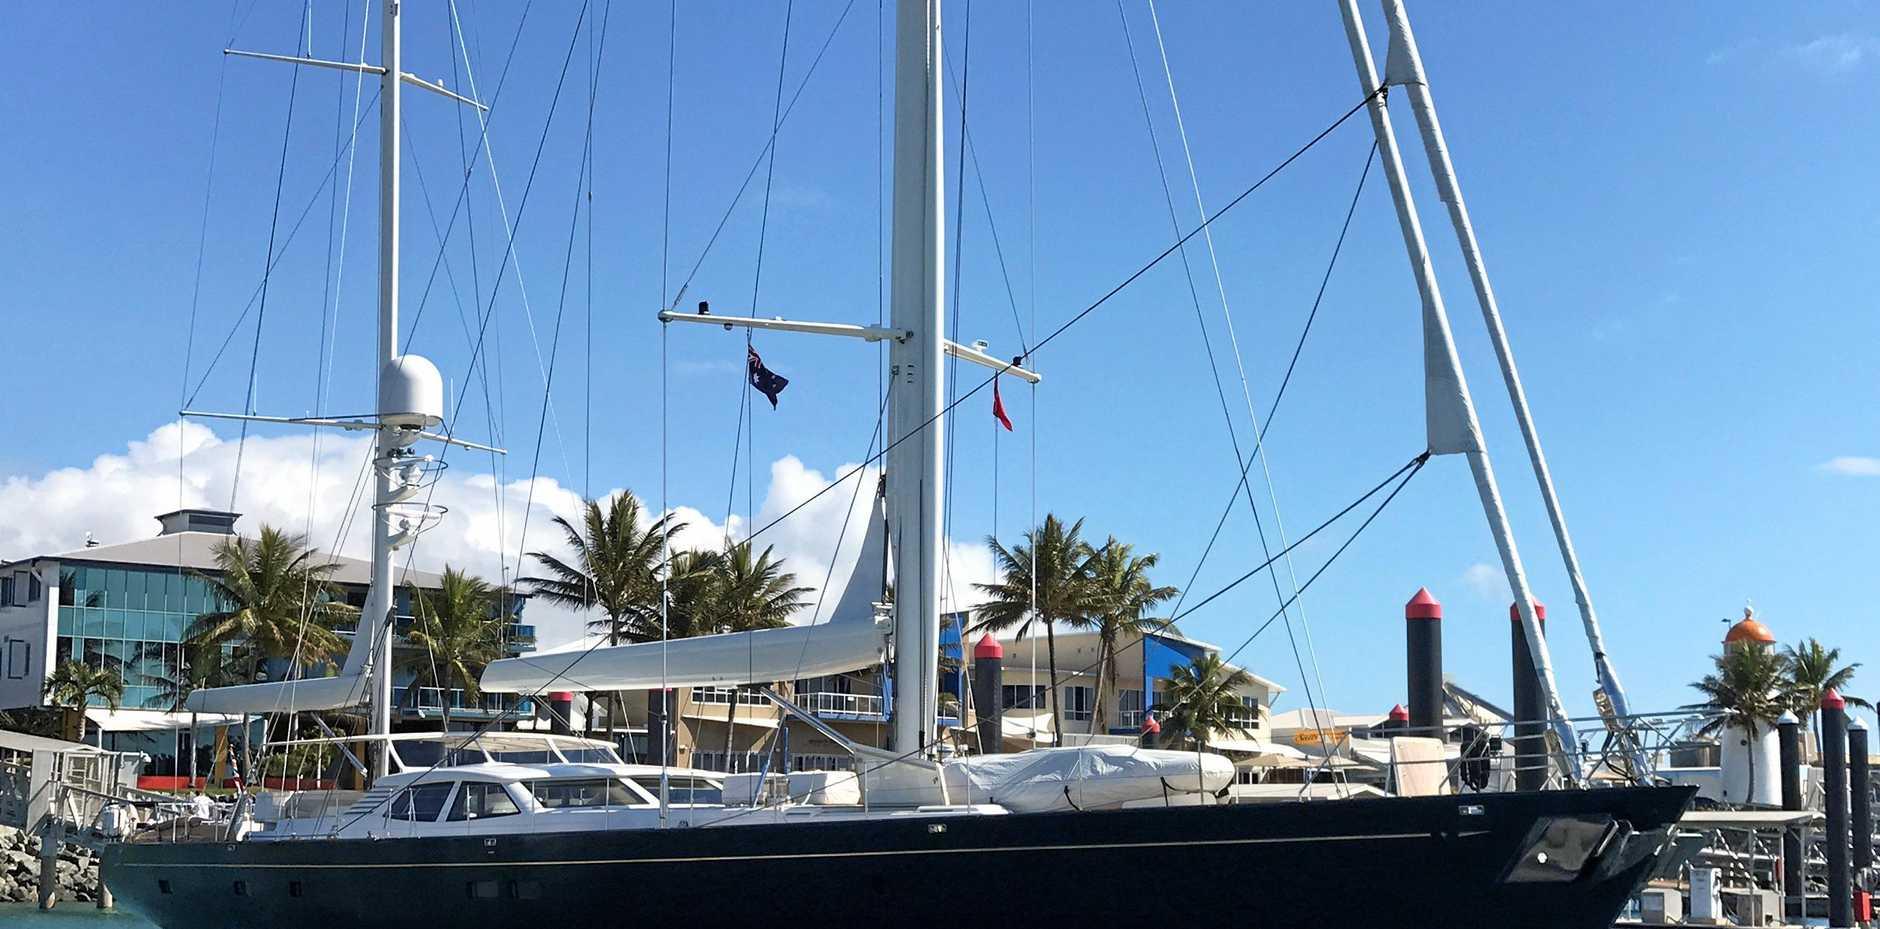 The Antares sailing yacht refueling in Mackay marina.